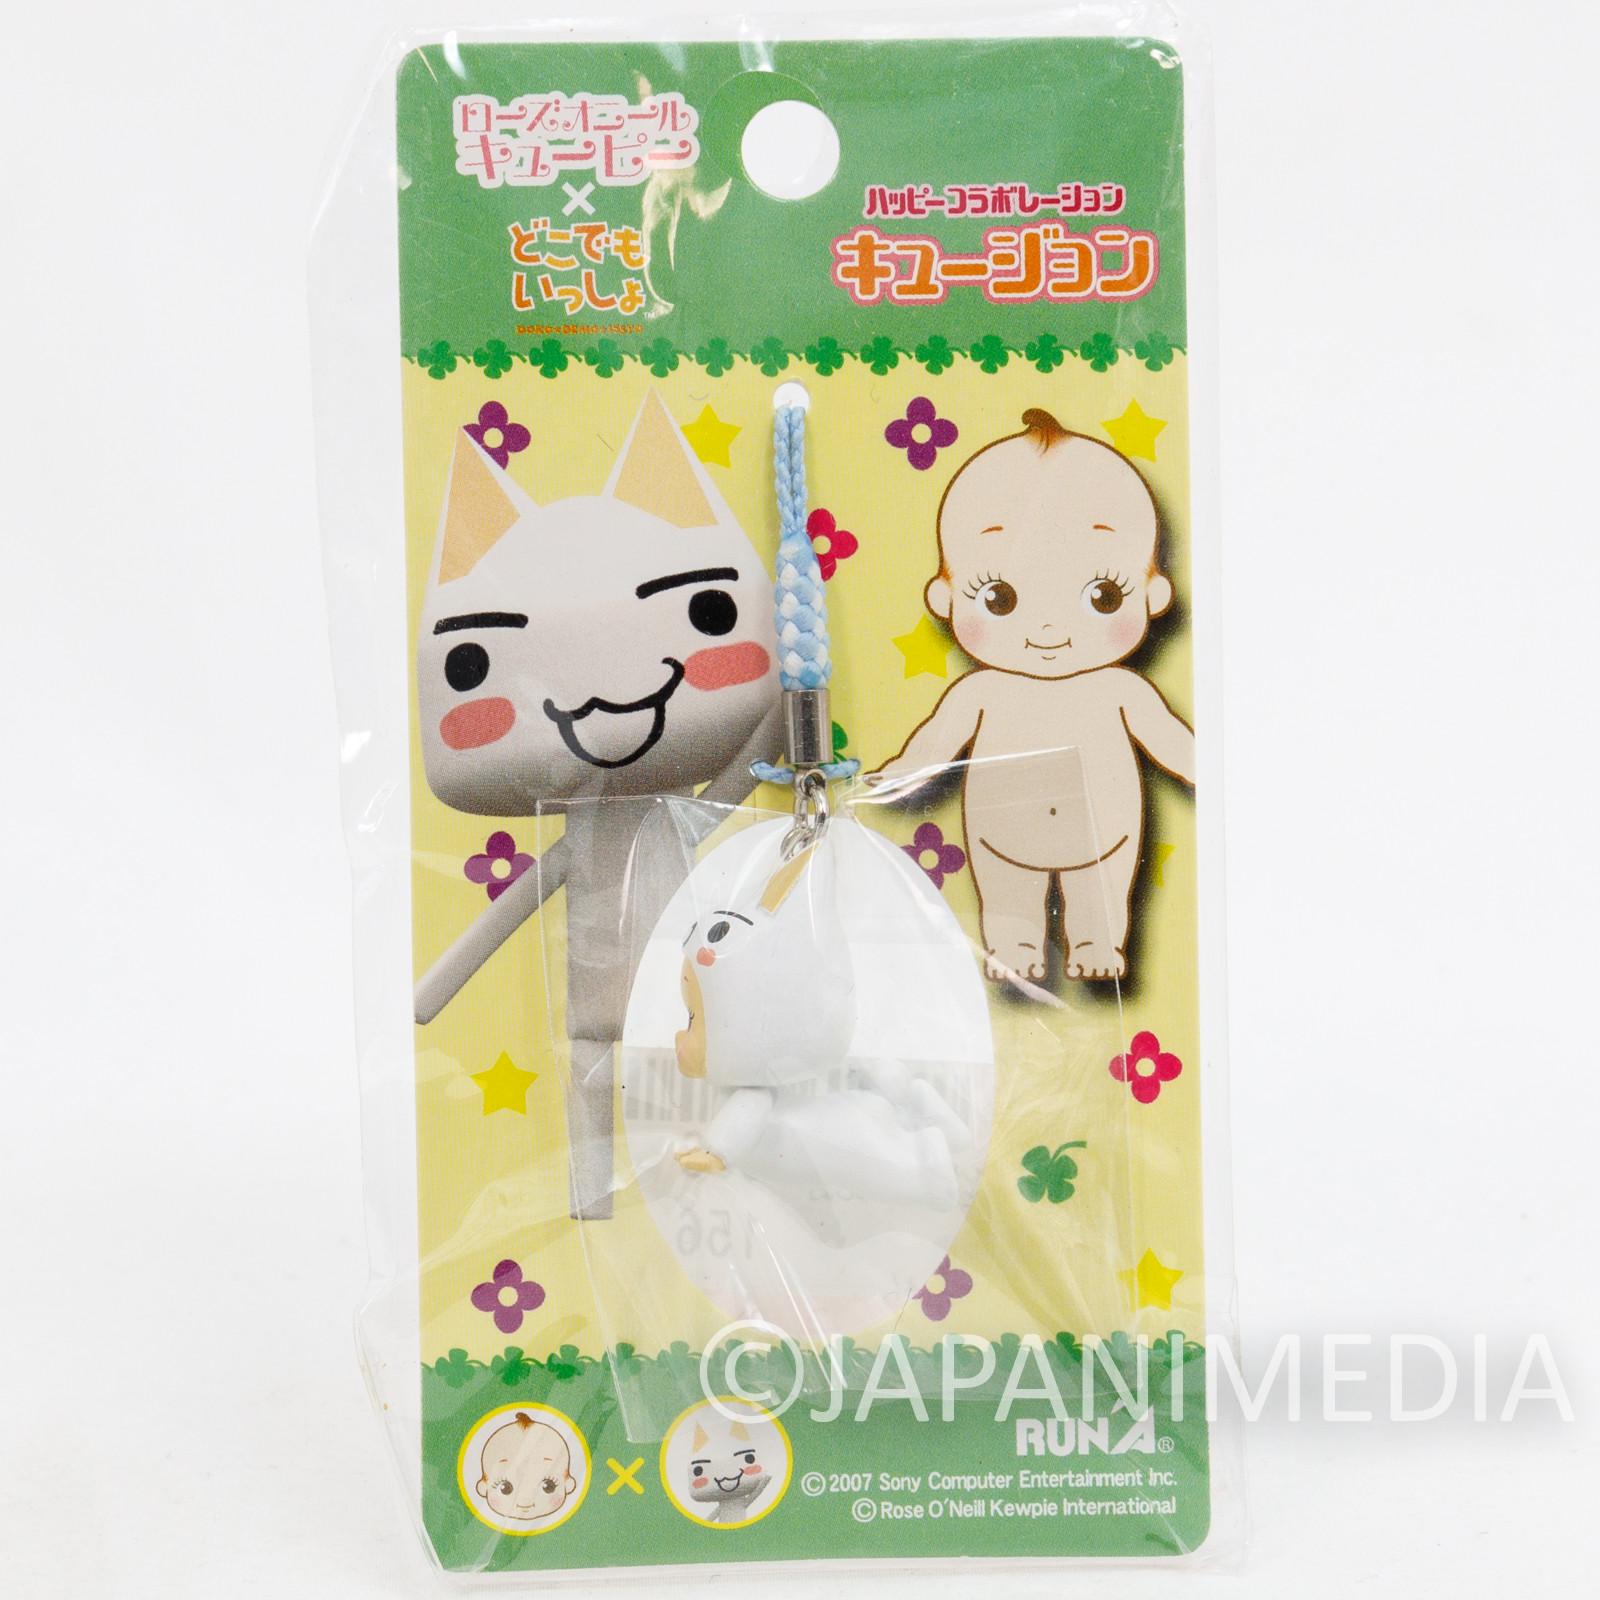 Sony Cat TORO Doko Demo Issyo Rose O'neill Kewpie Kewsion Figure Strap JAPAN ANIME